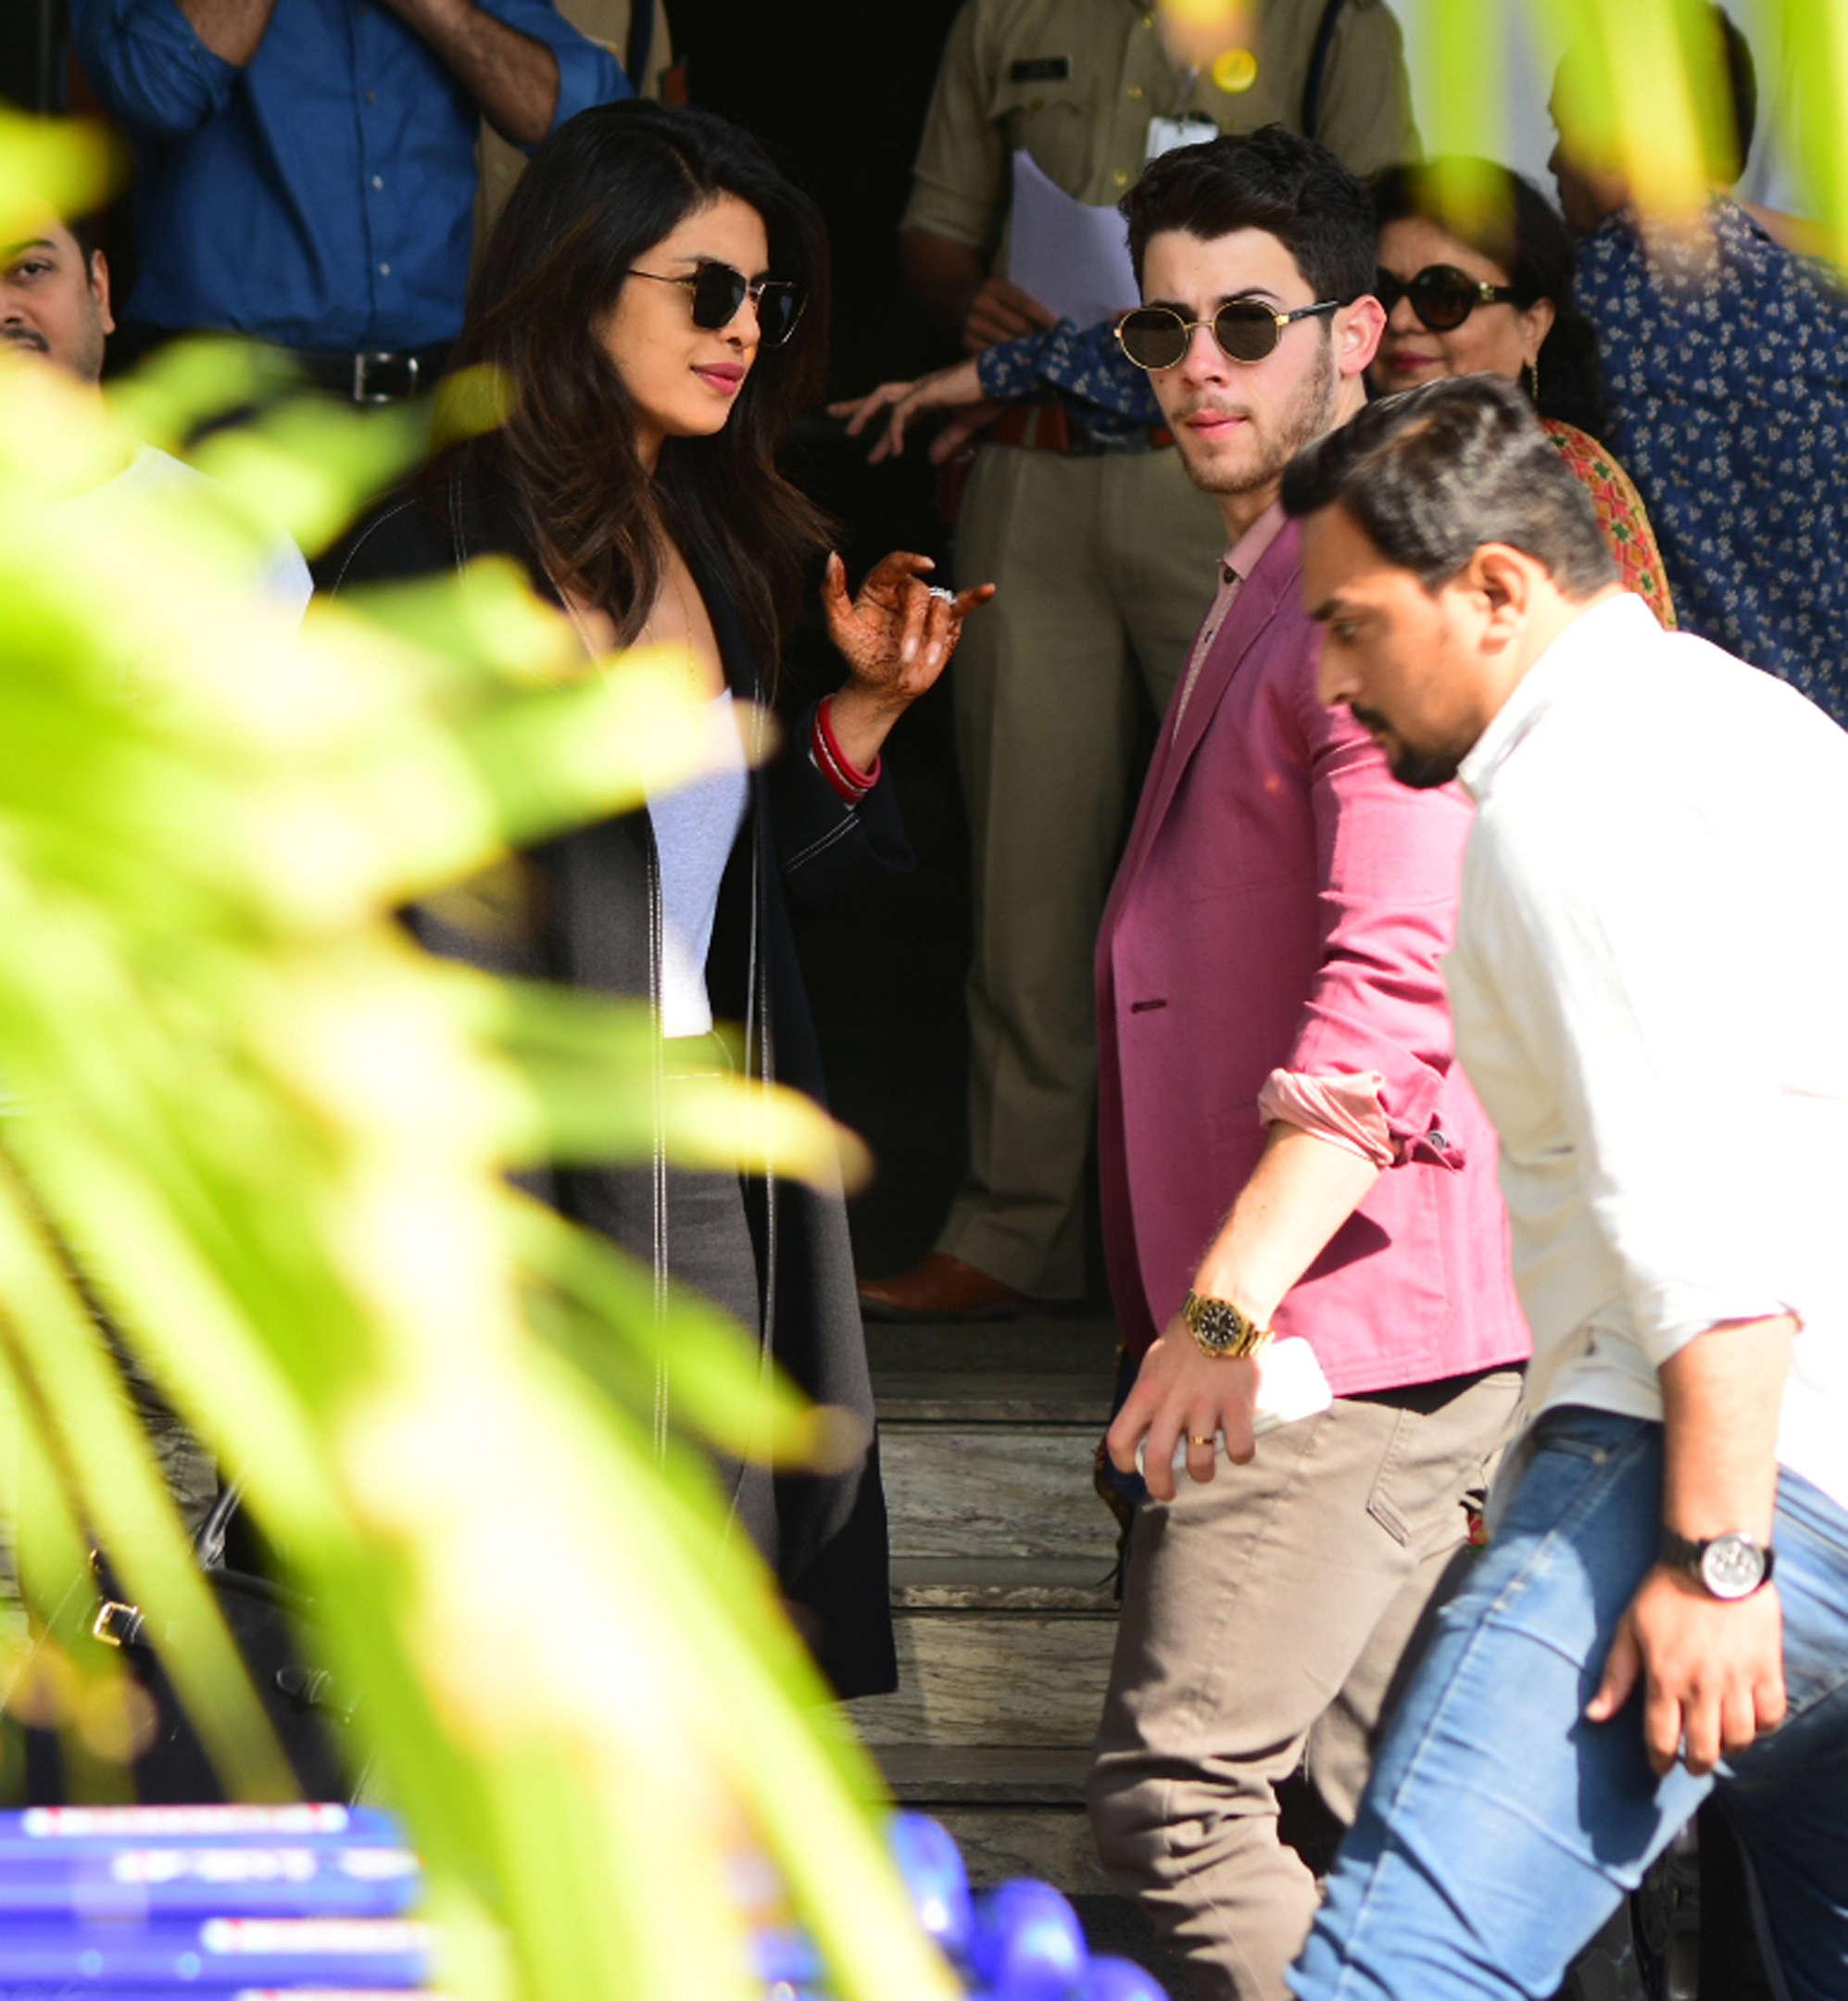 Nick Jonas and Priyank Chopra at Isha Ambani and Anand Piramal wedding